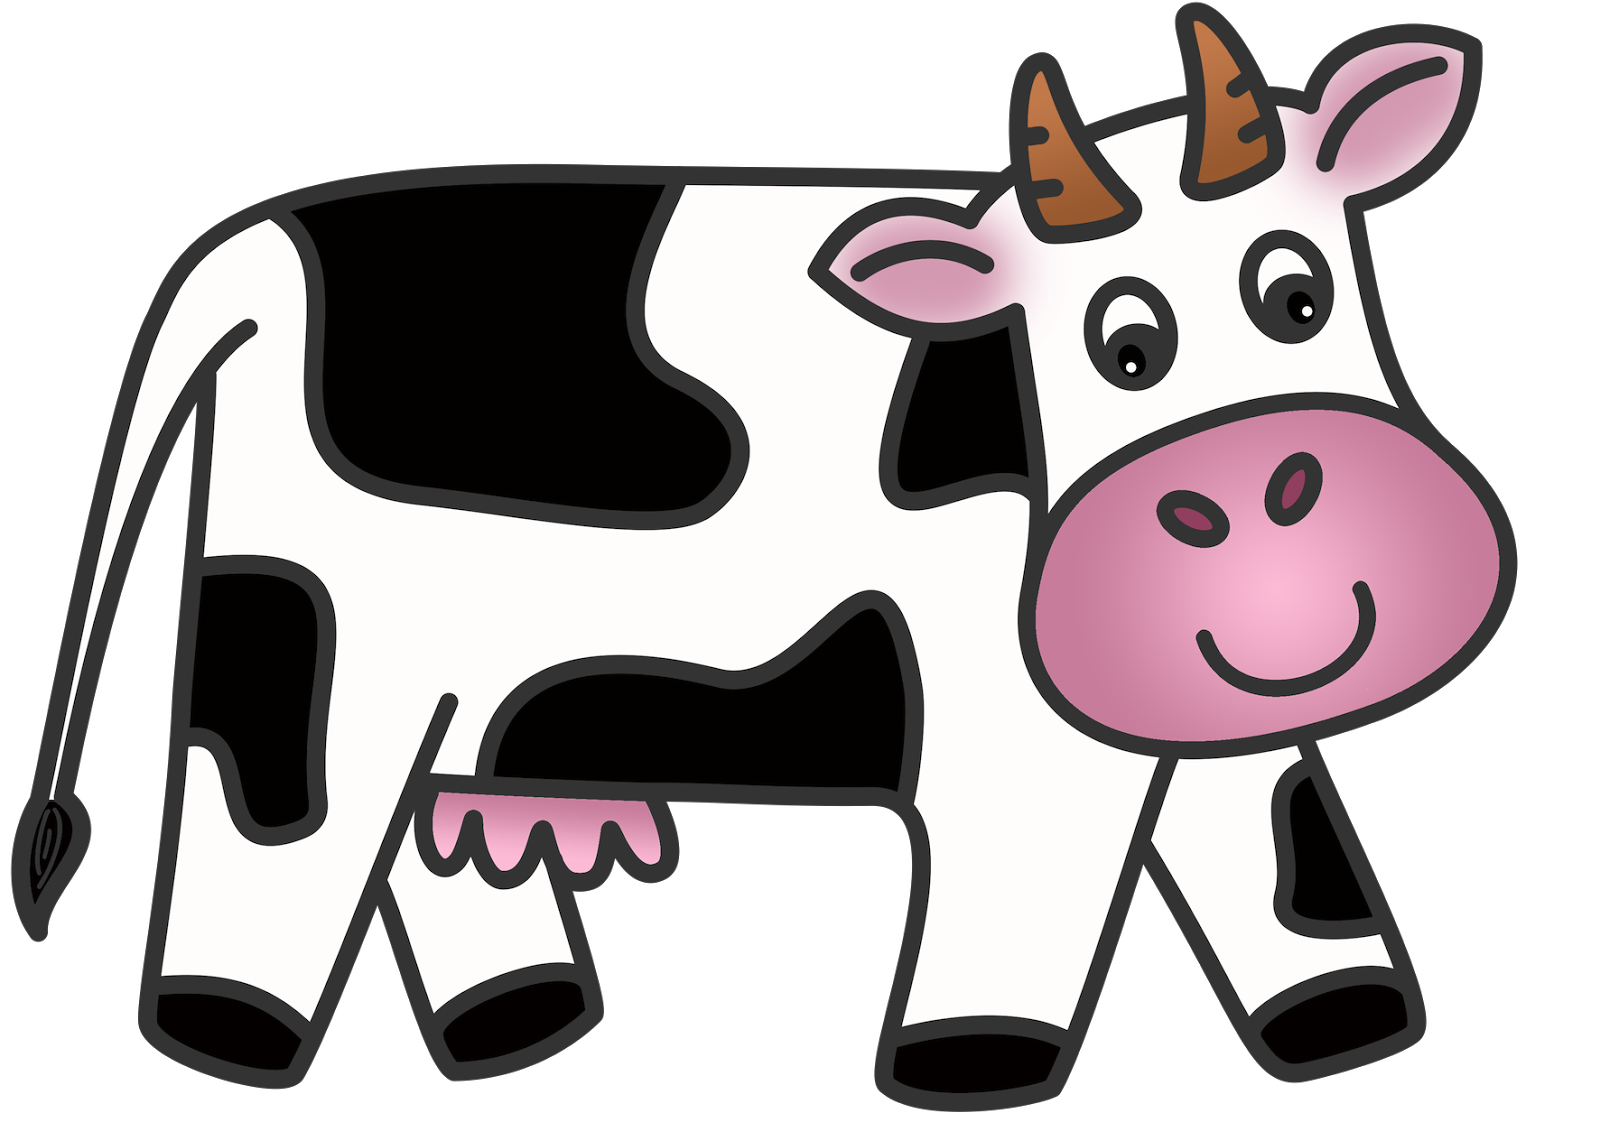 Cow Clip Art Animated Cow .-Cow Clip Art Animated Cow .-14